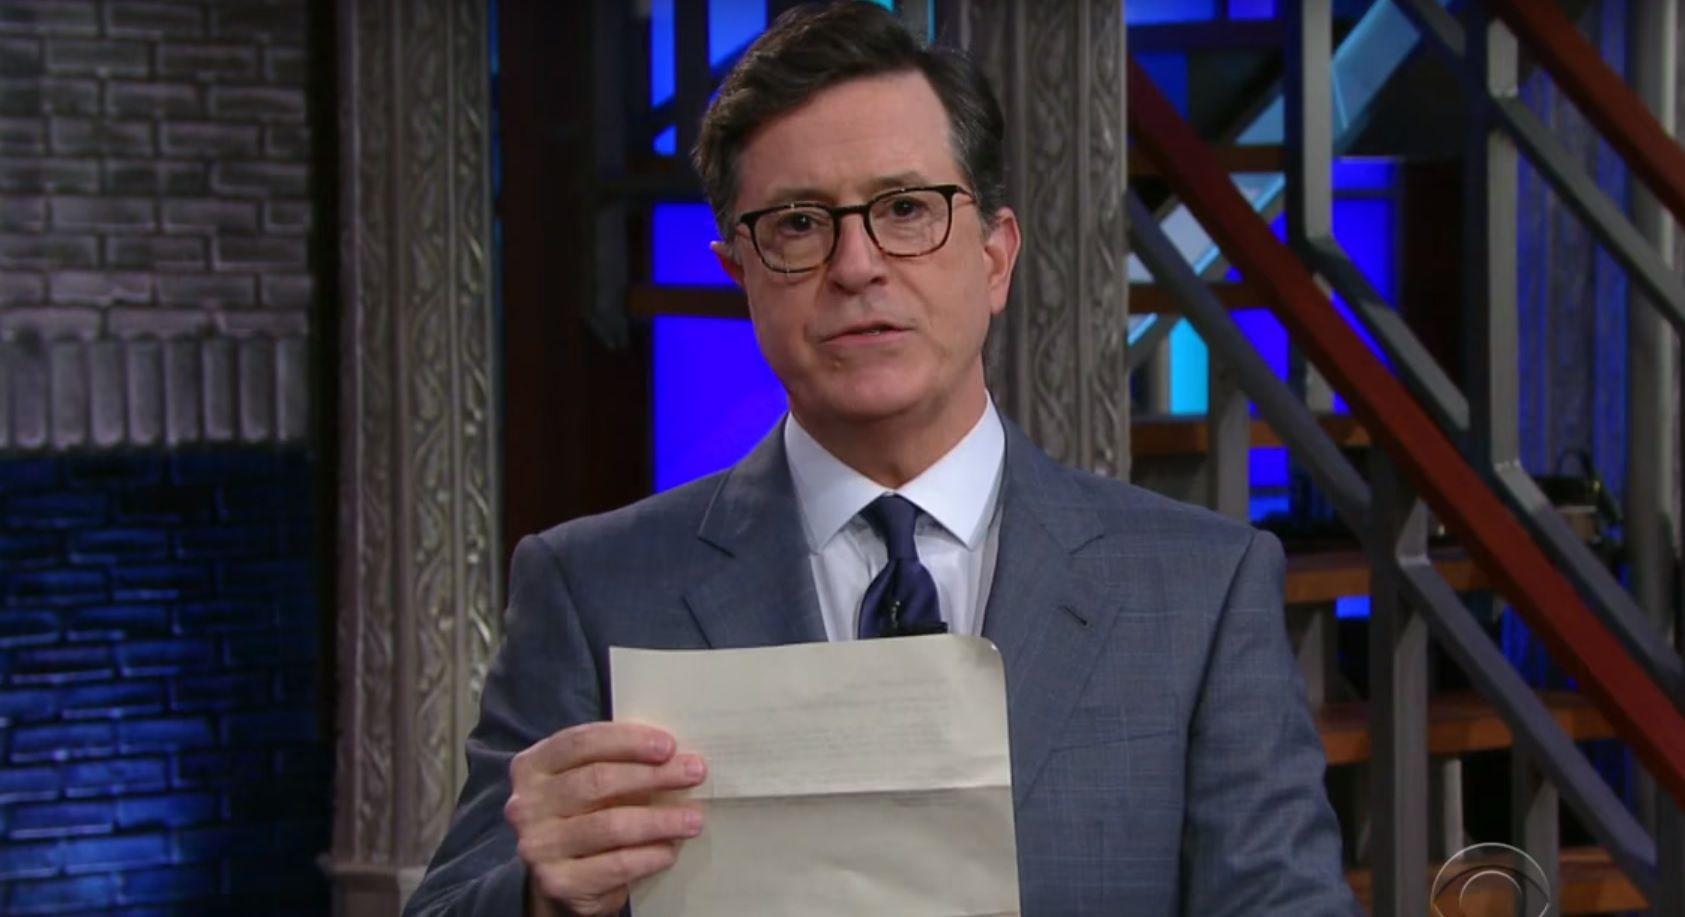 Stephen Colbert's intervention for Trump